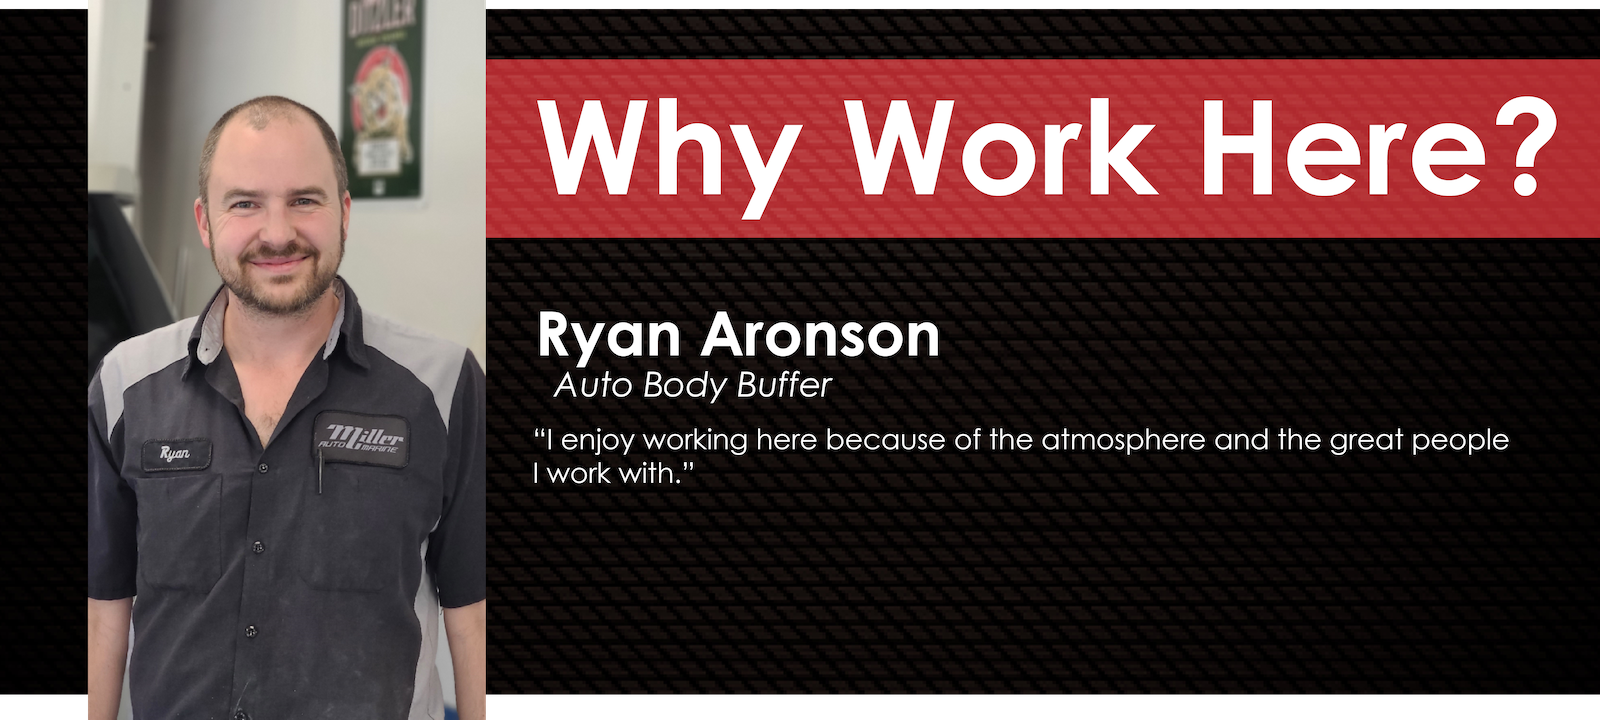 Ryan Aronson